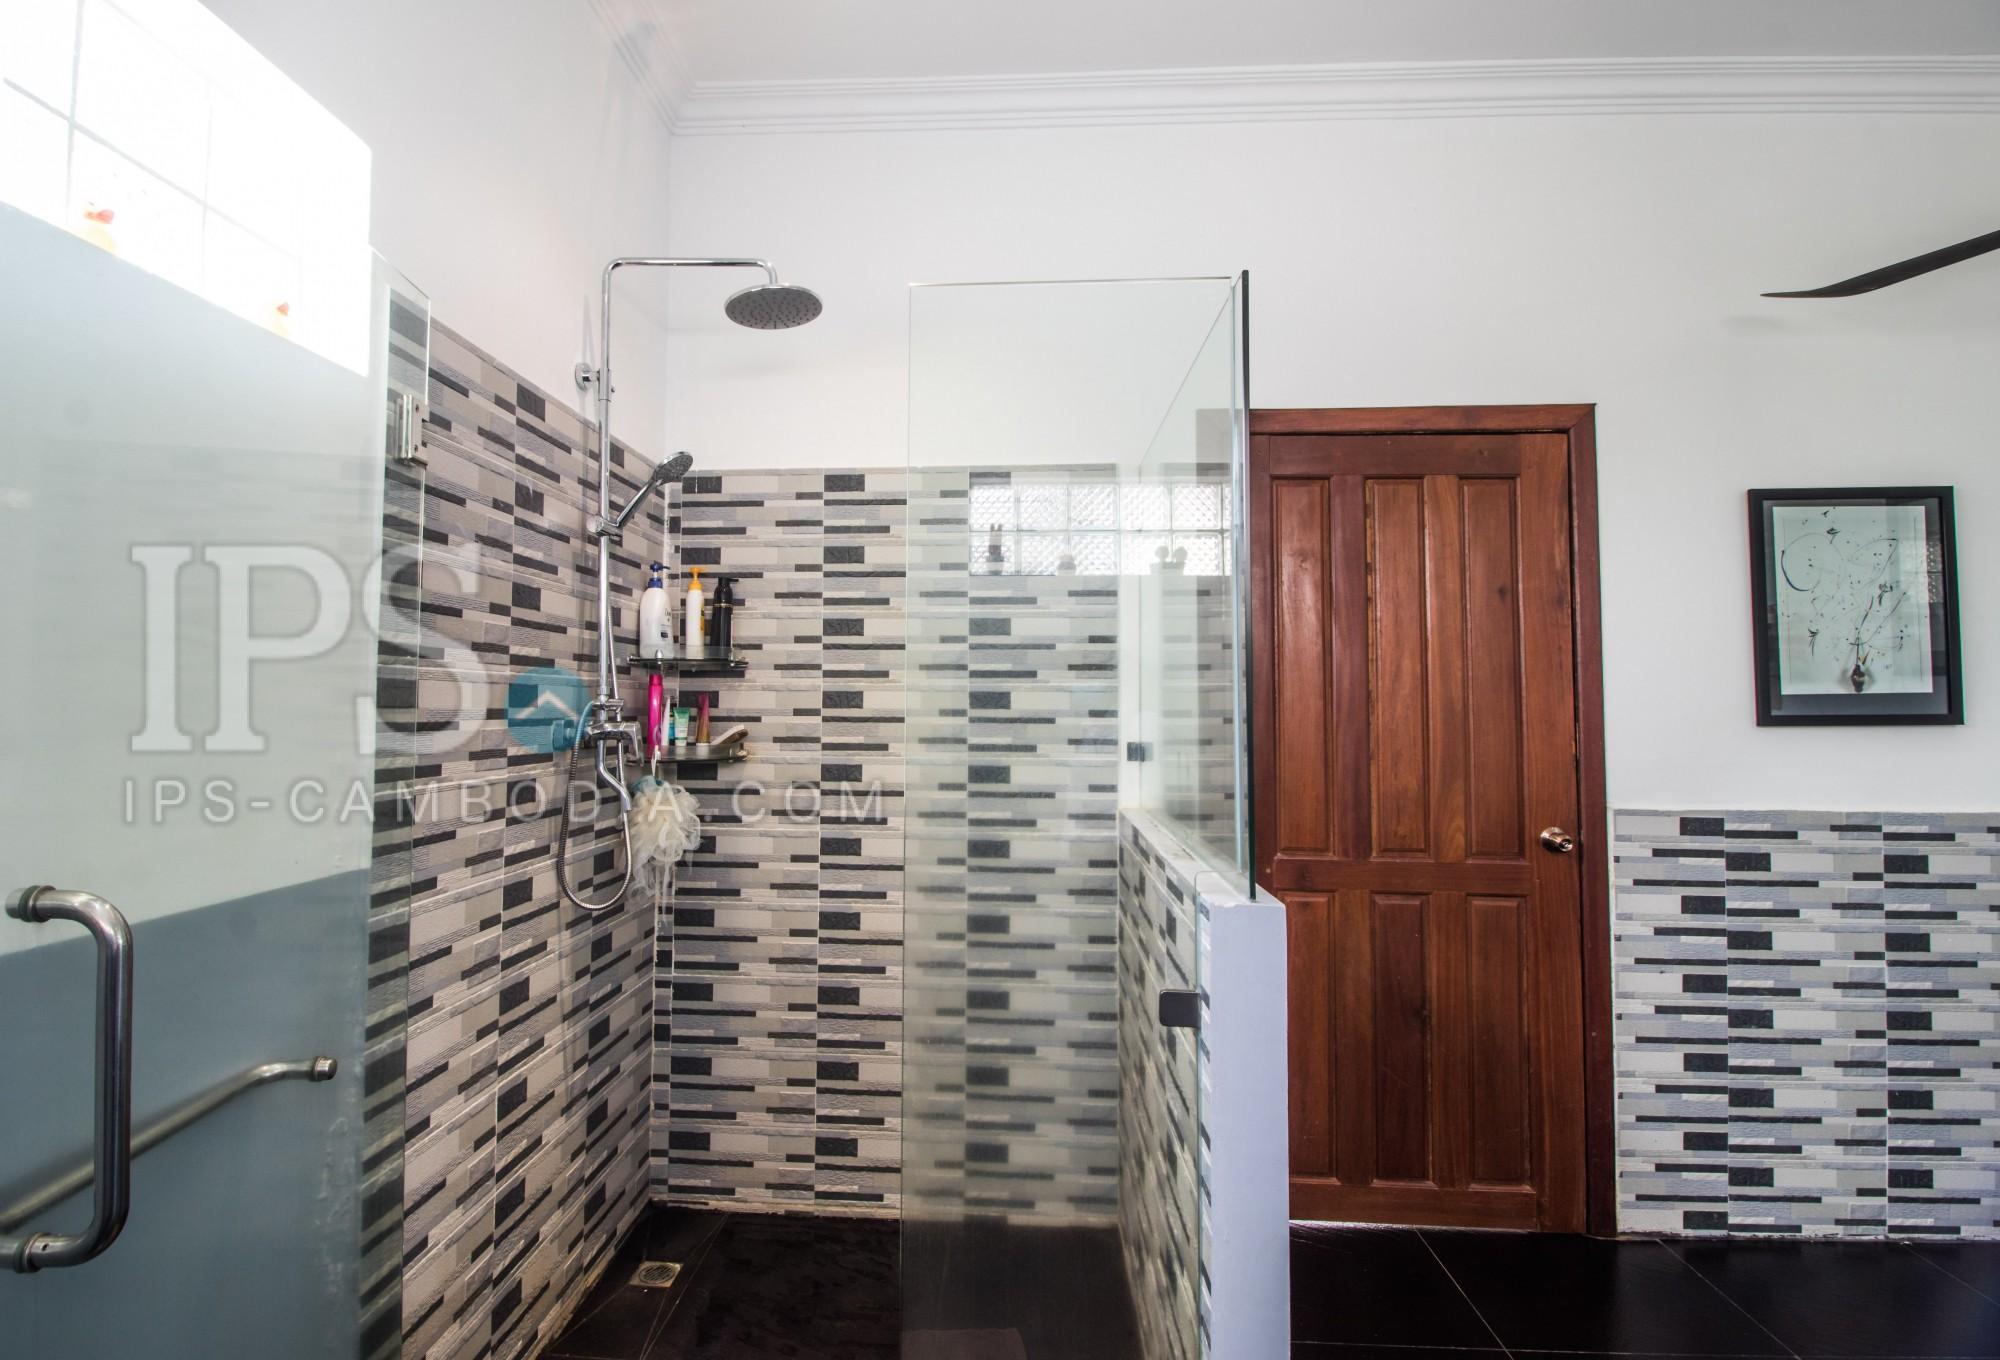 2 Bedroom Western-Style Villa For Rent - Kor Kranh, Siem Reap